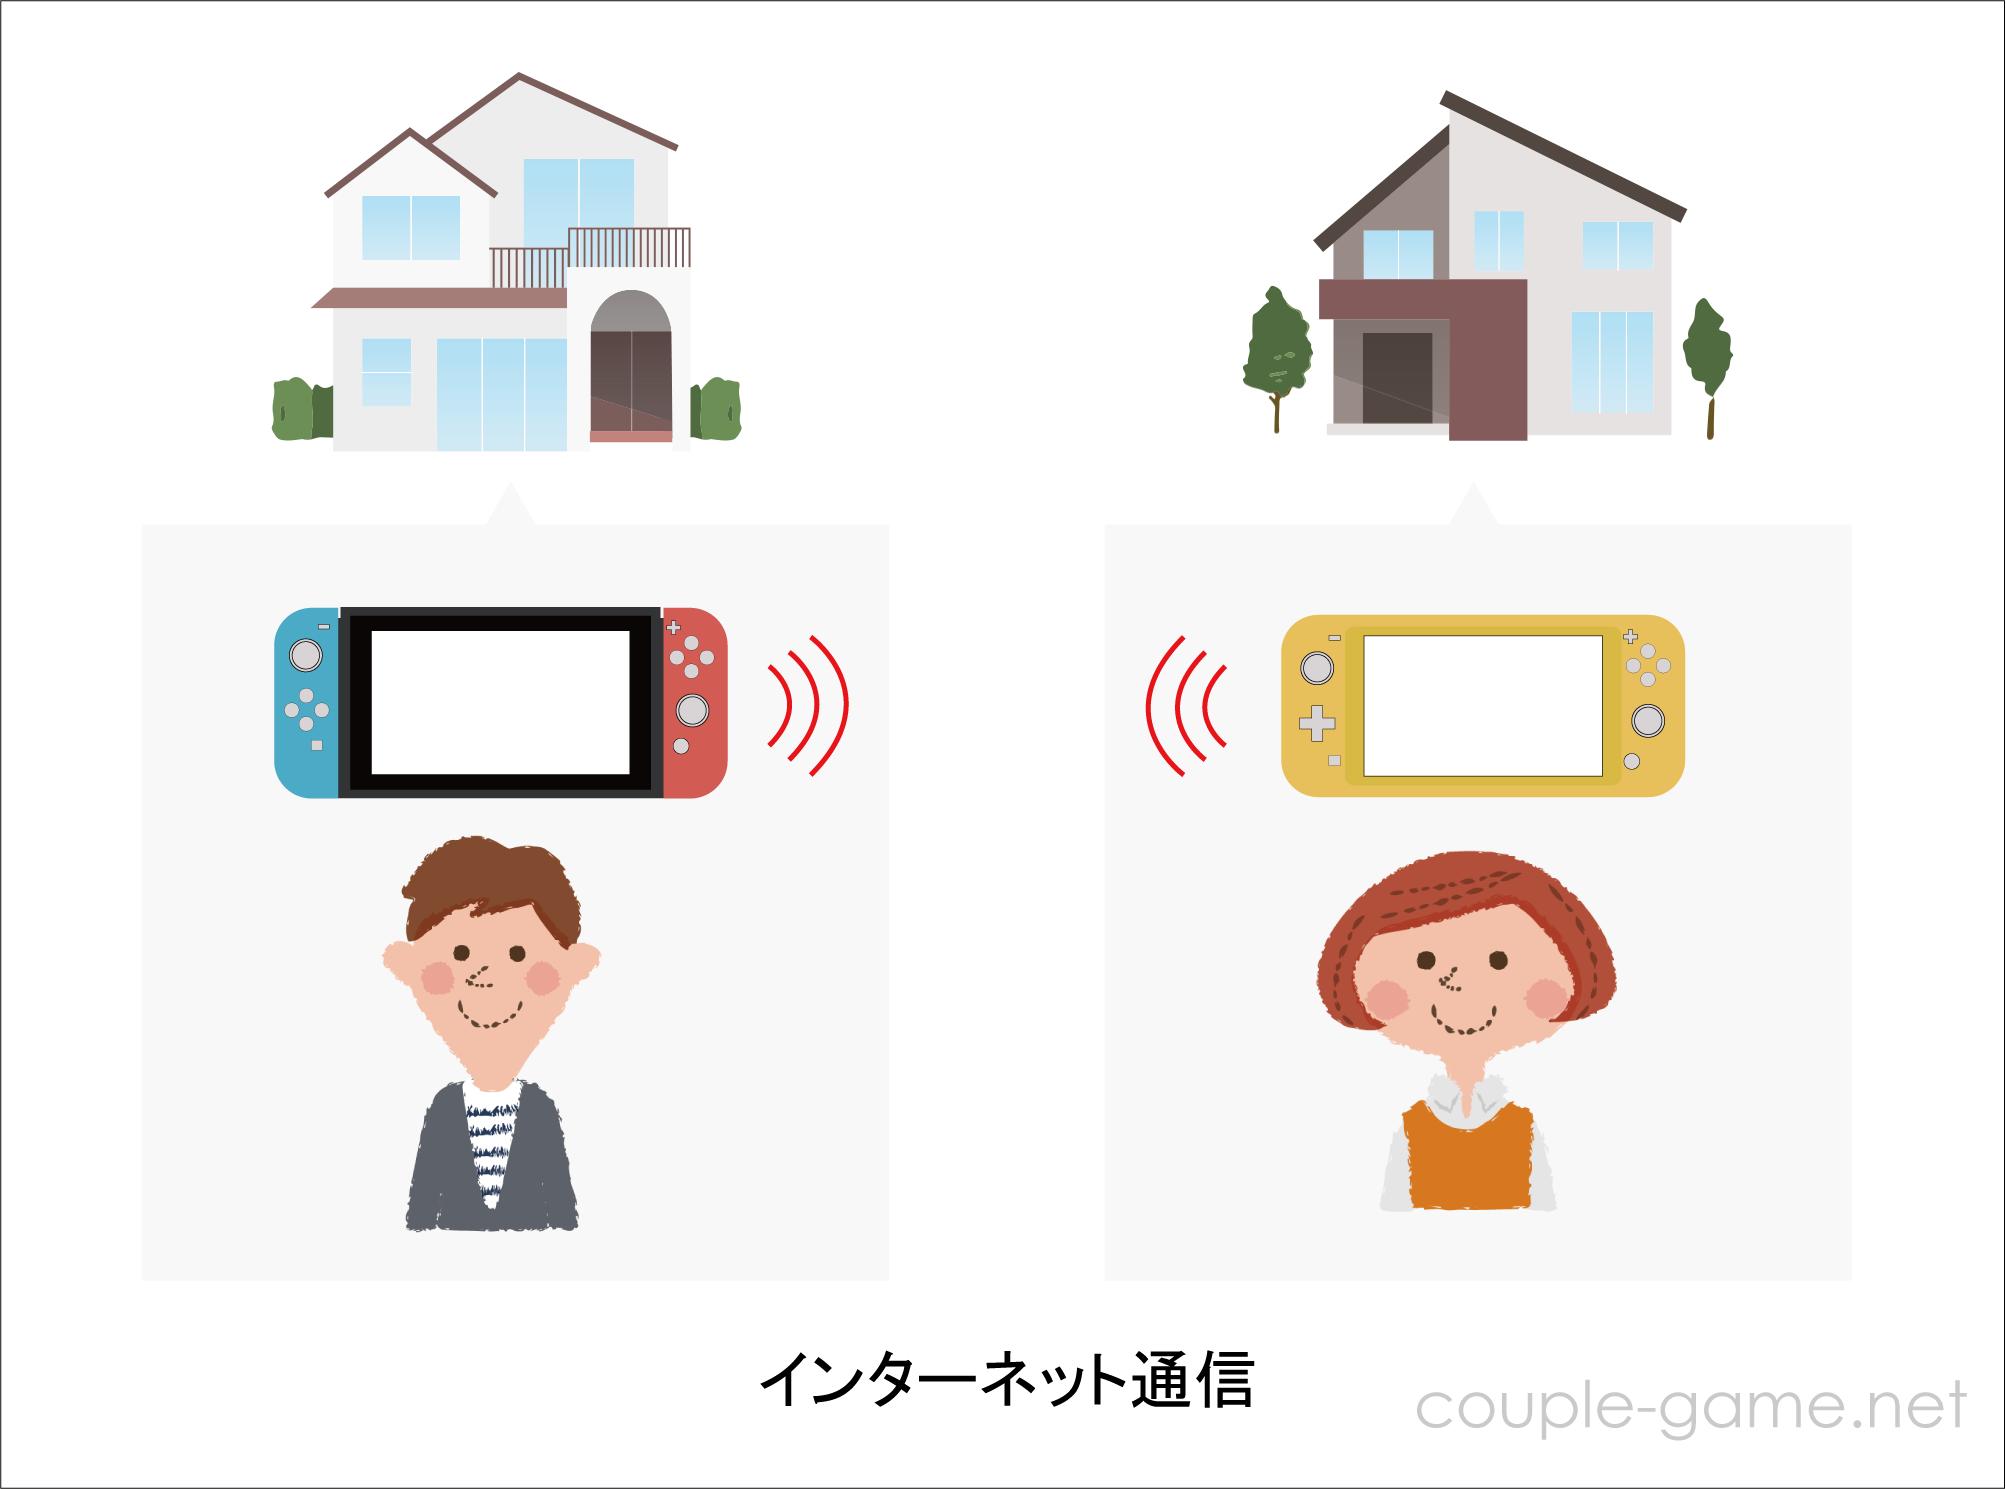 Switchのインターネット通信のイメージ